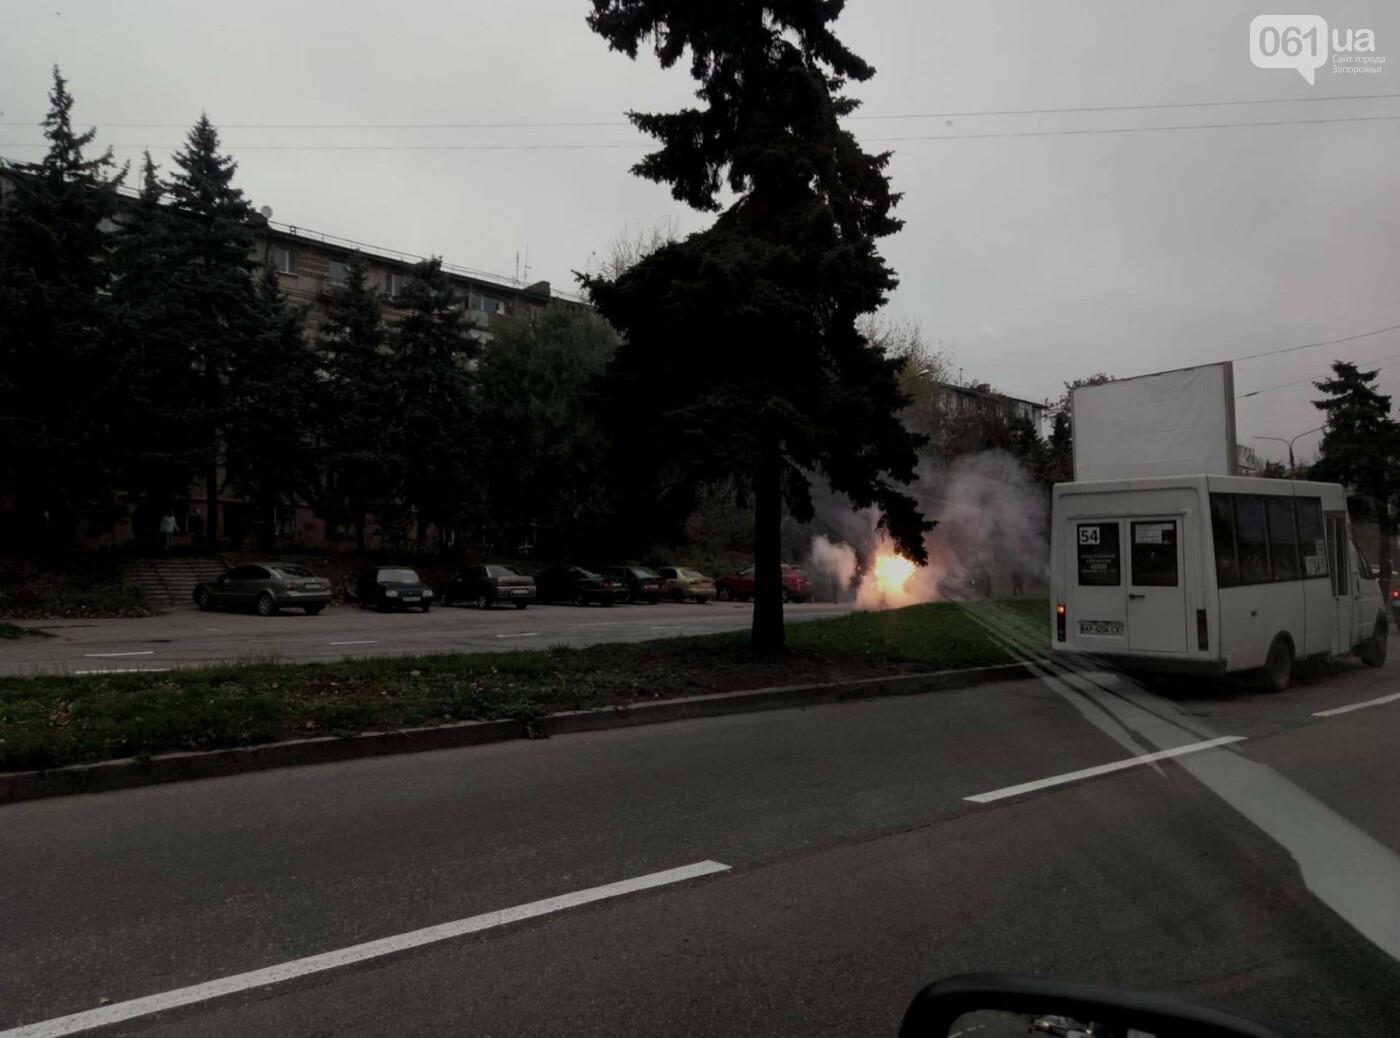 В Запорожье посреди дороги загорелся автомобиль, - ФОТО , фото-2